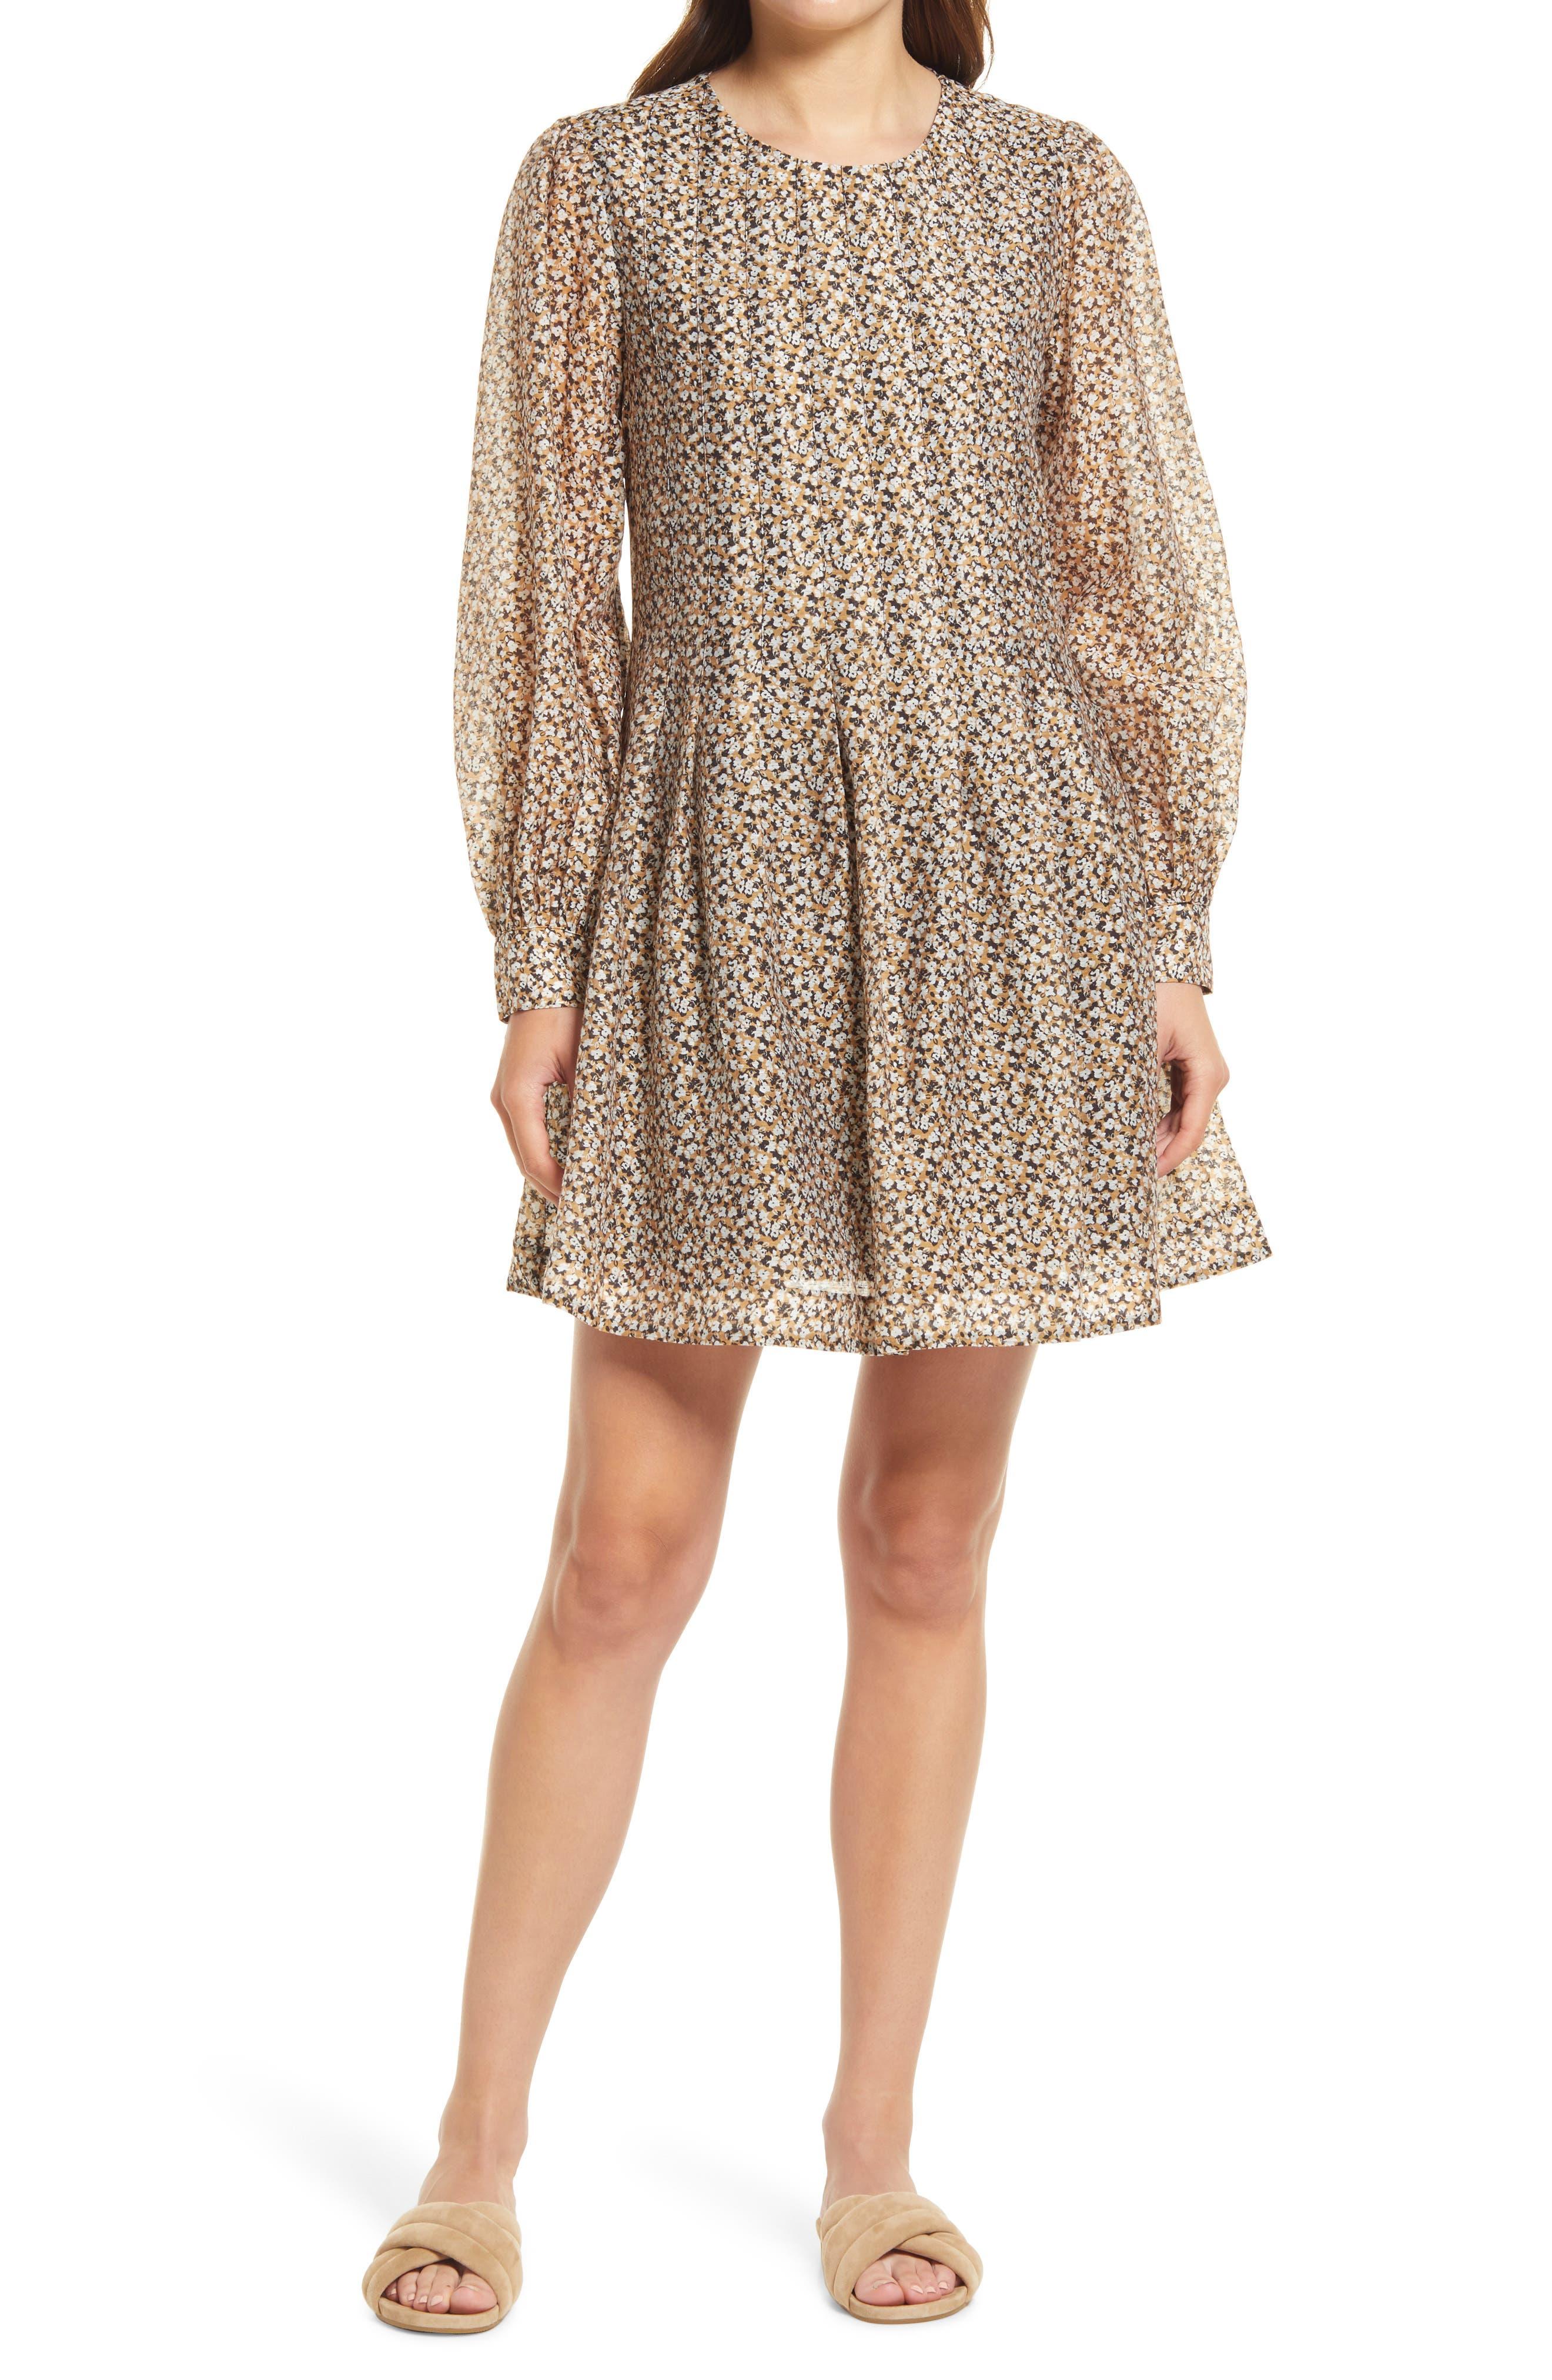 Bronte Pleat Long Sleeve Minidress